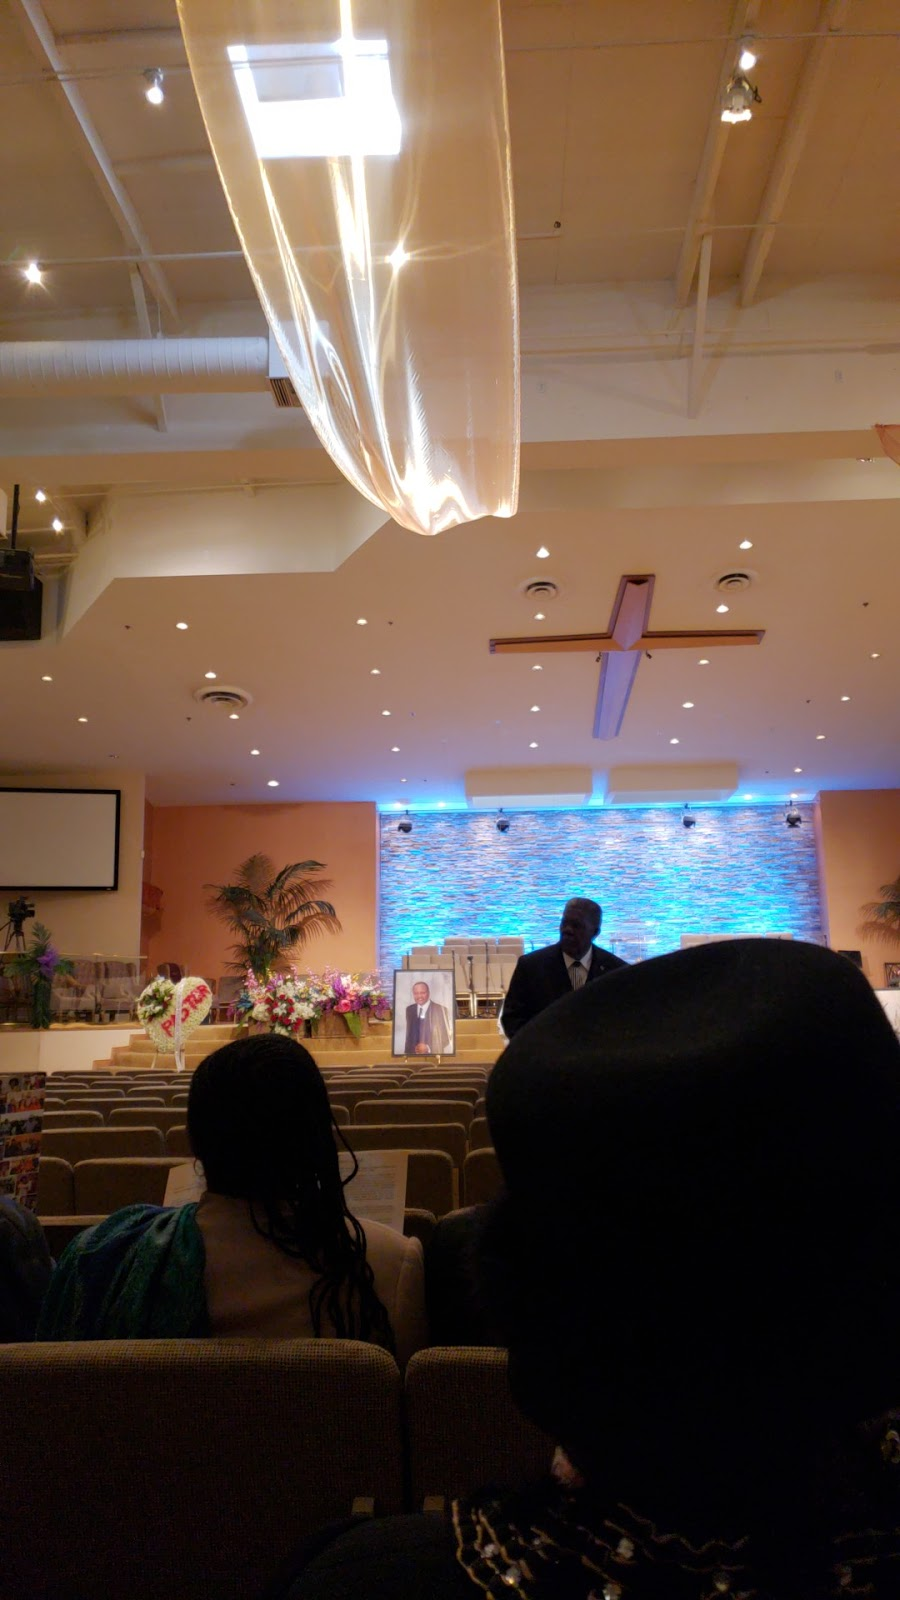 Love & Unity Christian Fellowship - church  | Photo 10 of 10 | Address: 1840 S Wilmington Ave, Compton, CA 90220, USA | Phone: (310) 604-5900